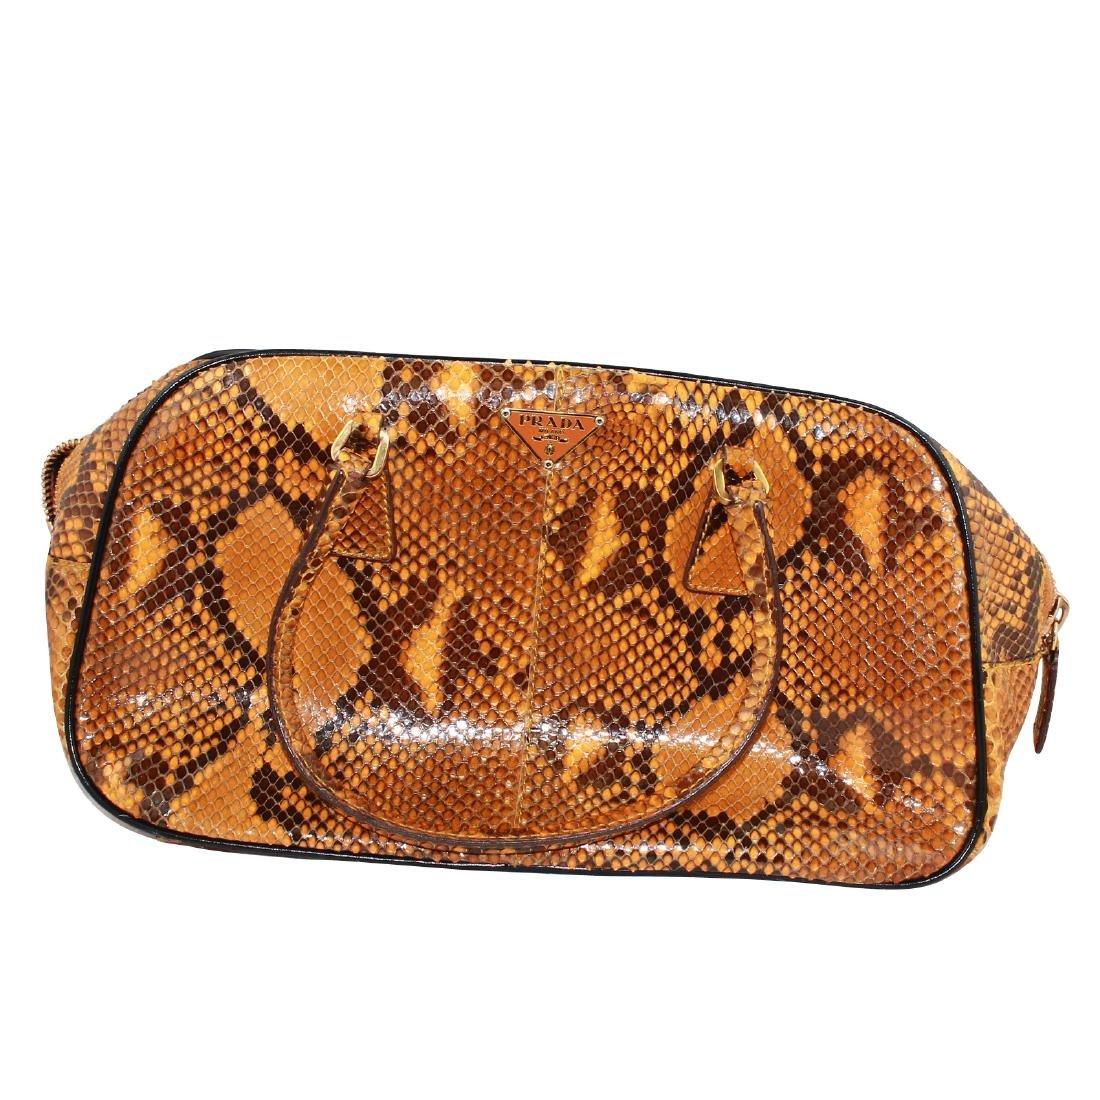 Prada Python Pittone Tote Bag Orange (Melograno)